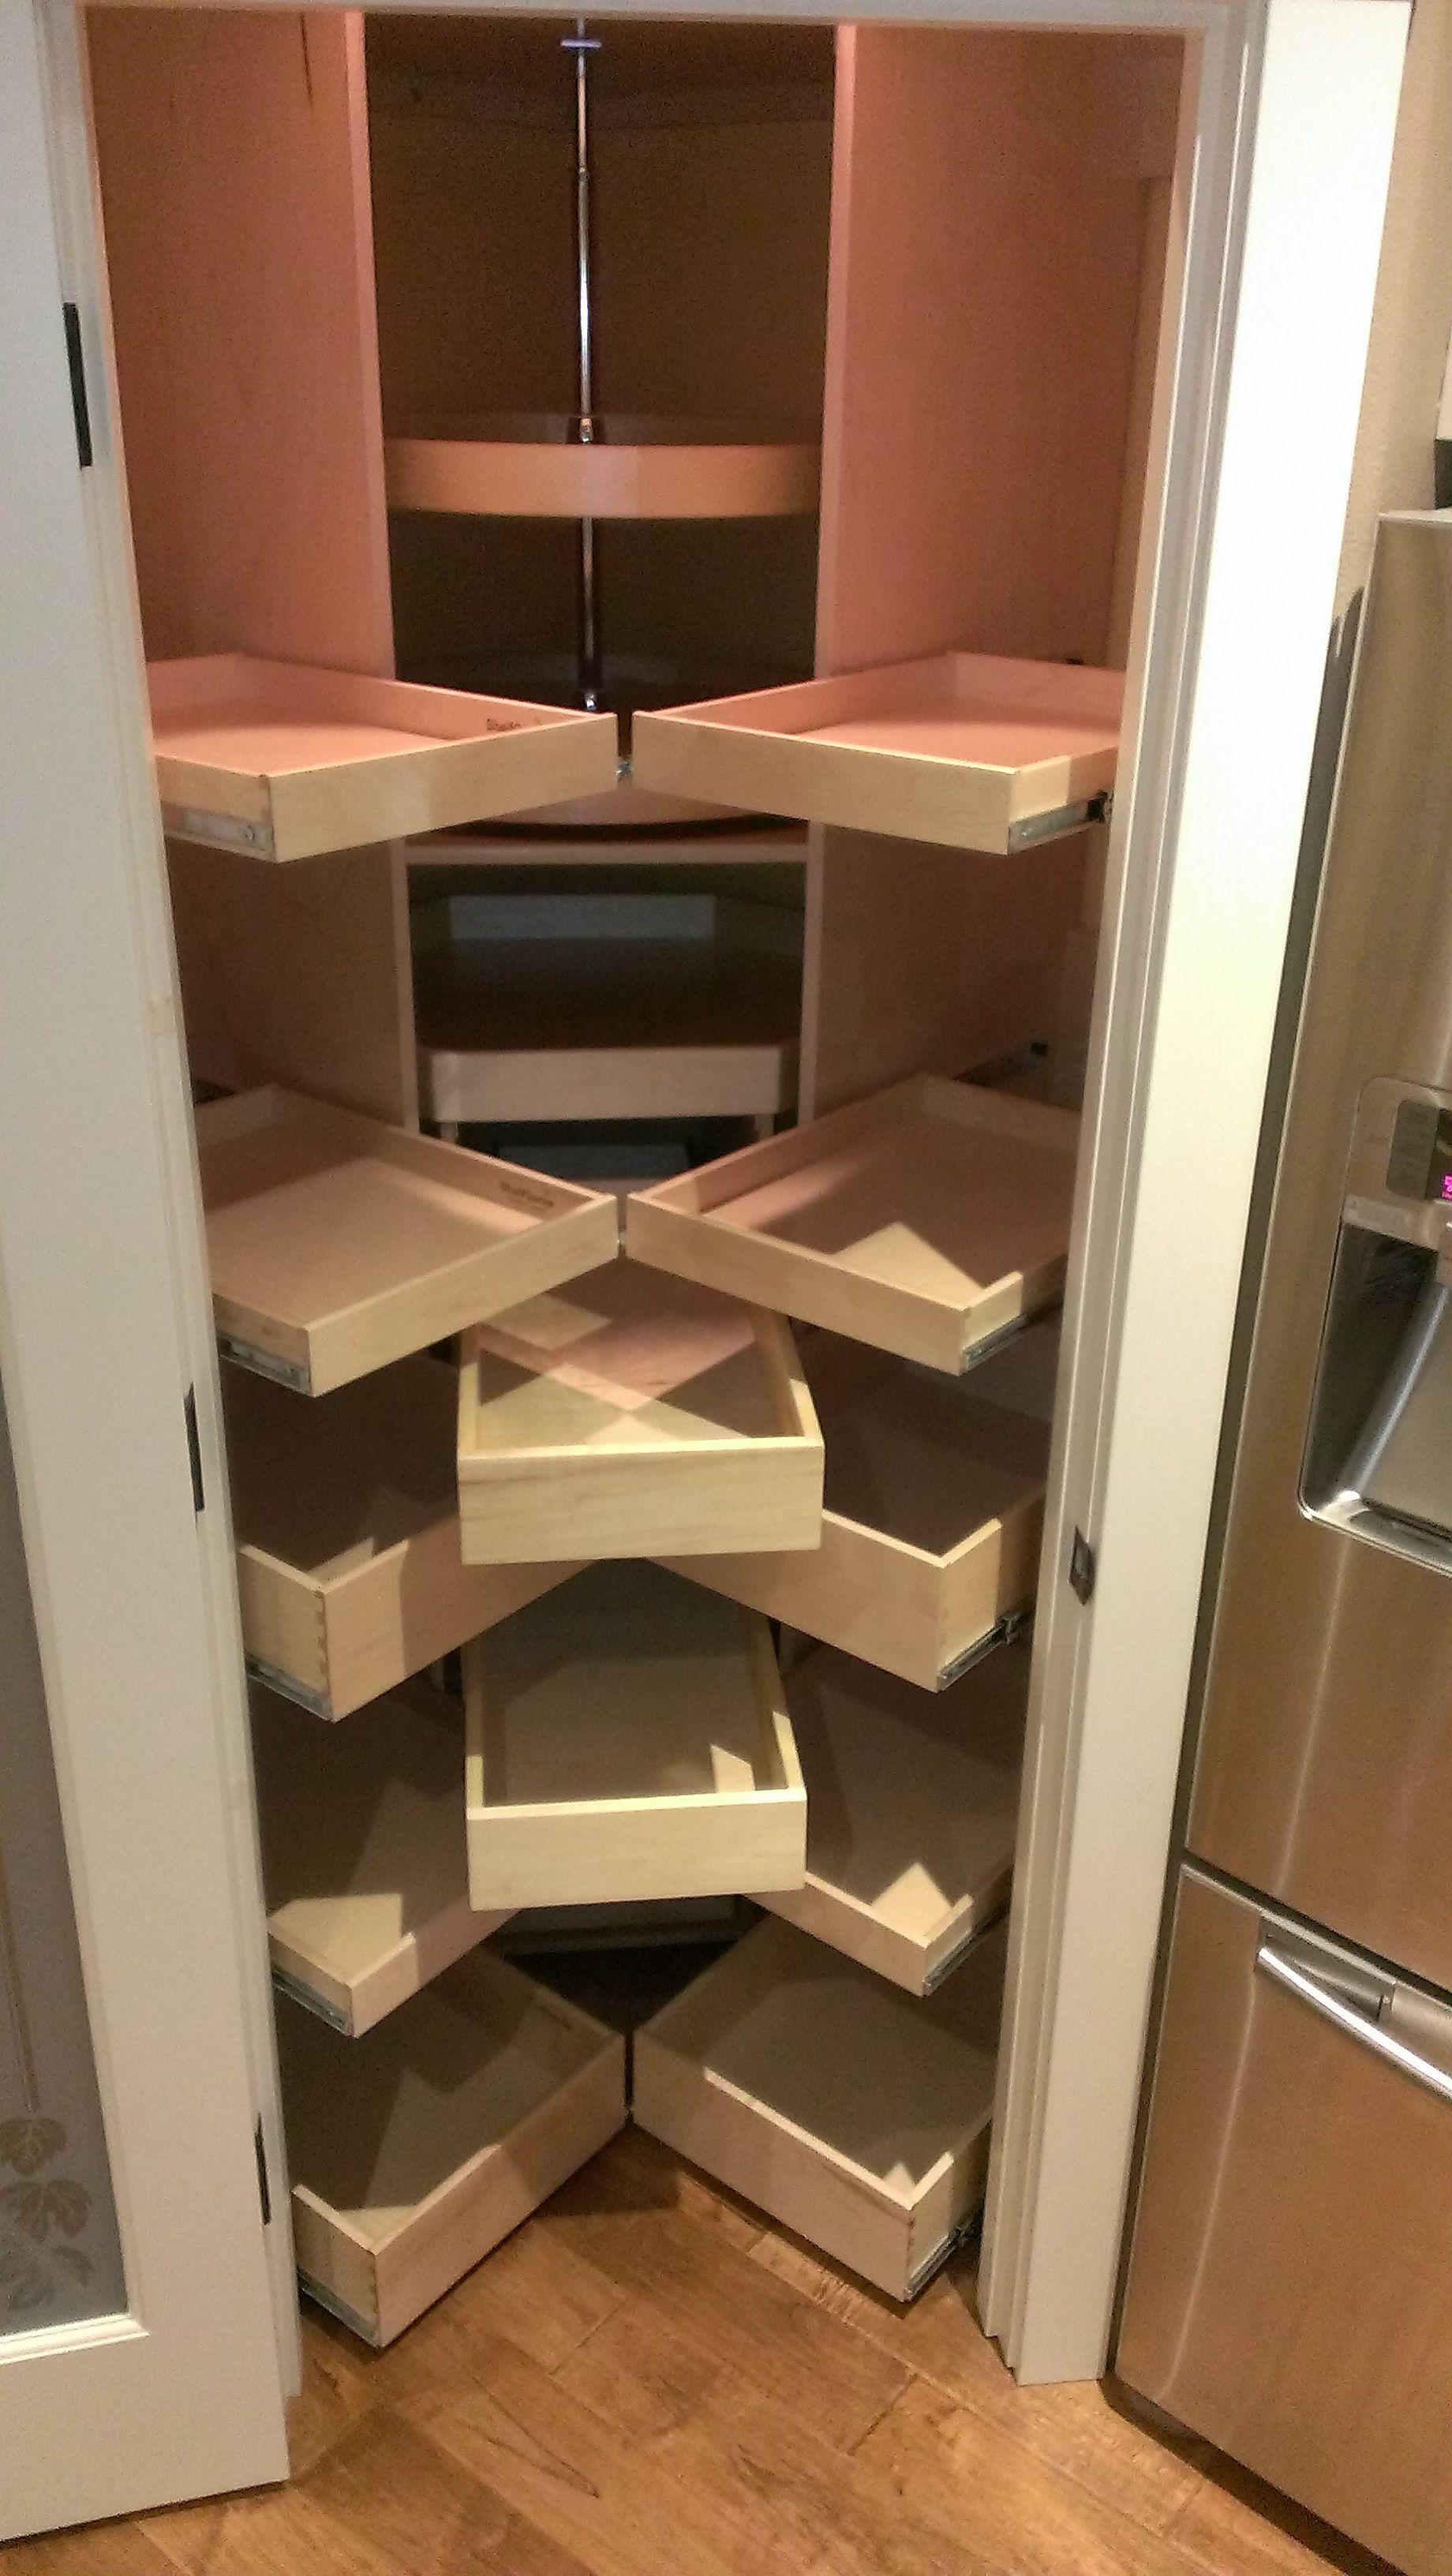 Ebony Wood Bordeaux Windham Door Pull Out Kitchen Cabinet Prepossessing Pull Out Kitchen Cabinet Inspiration Design